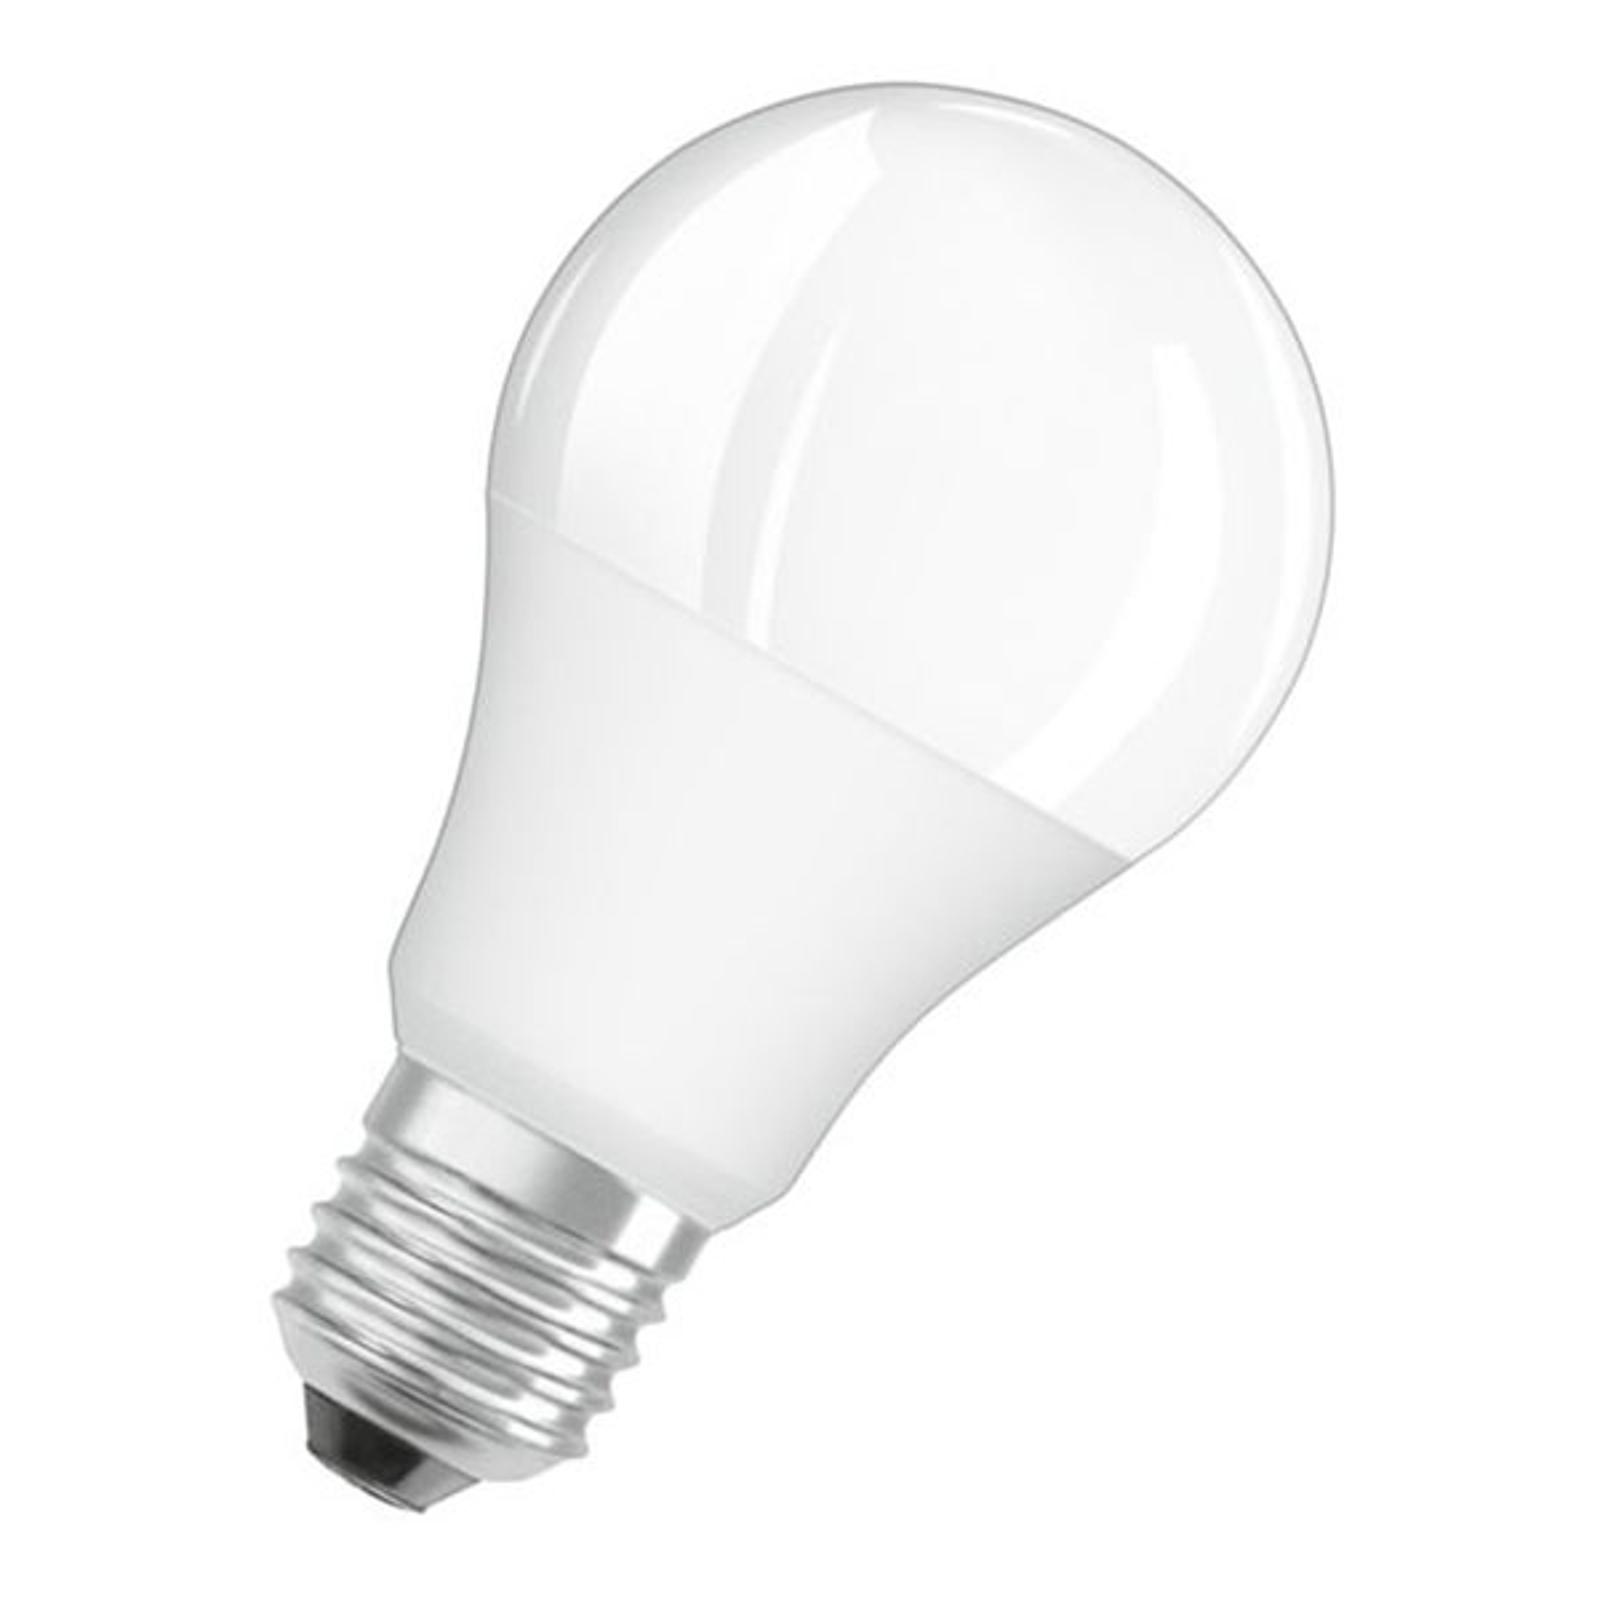 OSRAM żarówka LED E27 9W Star+ RemoteControl 2 szt